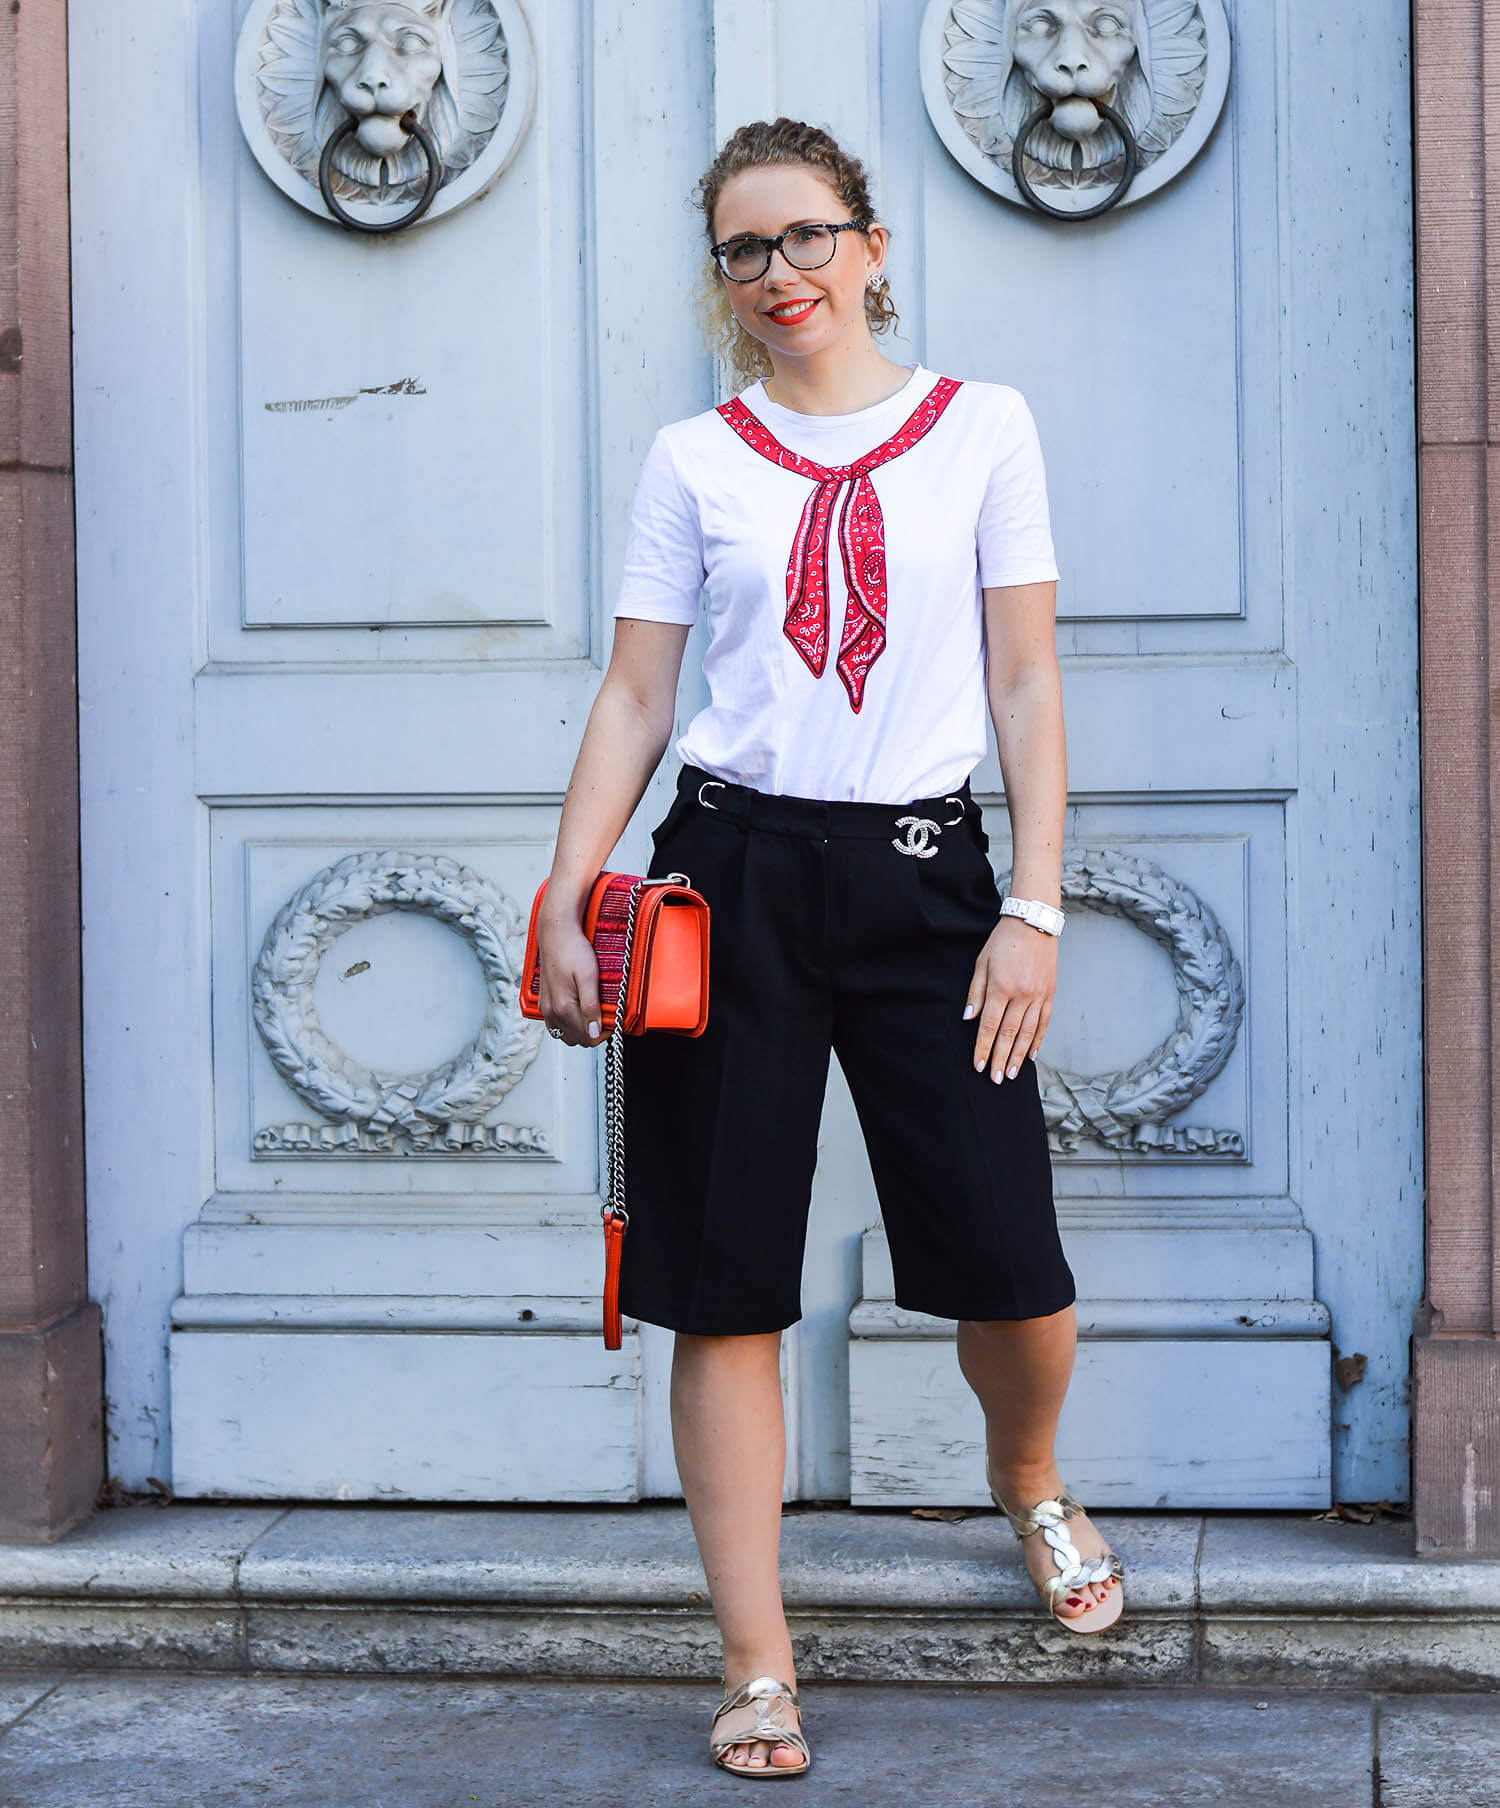 kationette-fashionblog-nrw-Outfit-Culottes-Bandana-Rebecca-Minkoff-Bag-Zara-Sandals